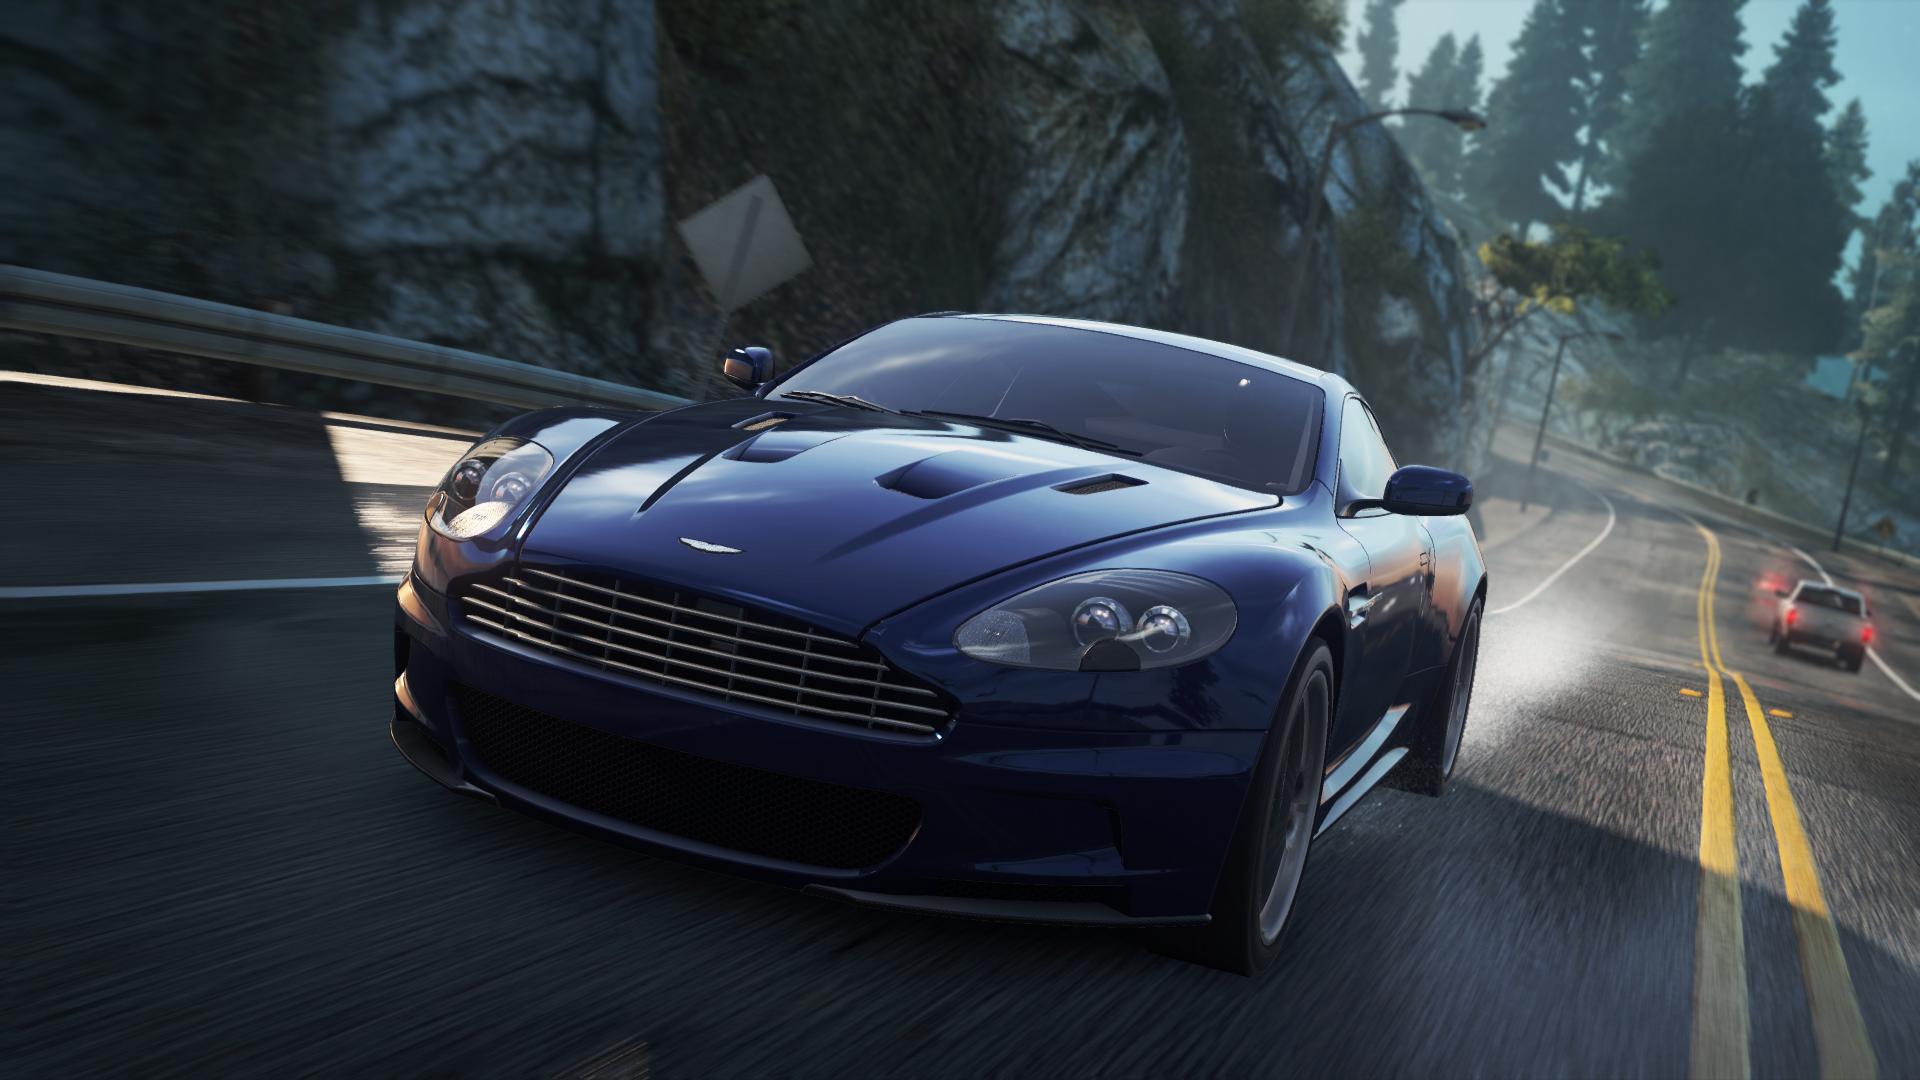 Aston Martin Dbs Need For Speed Wiki Fandom